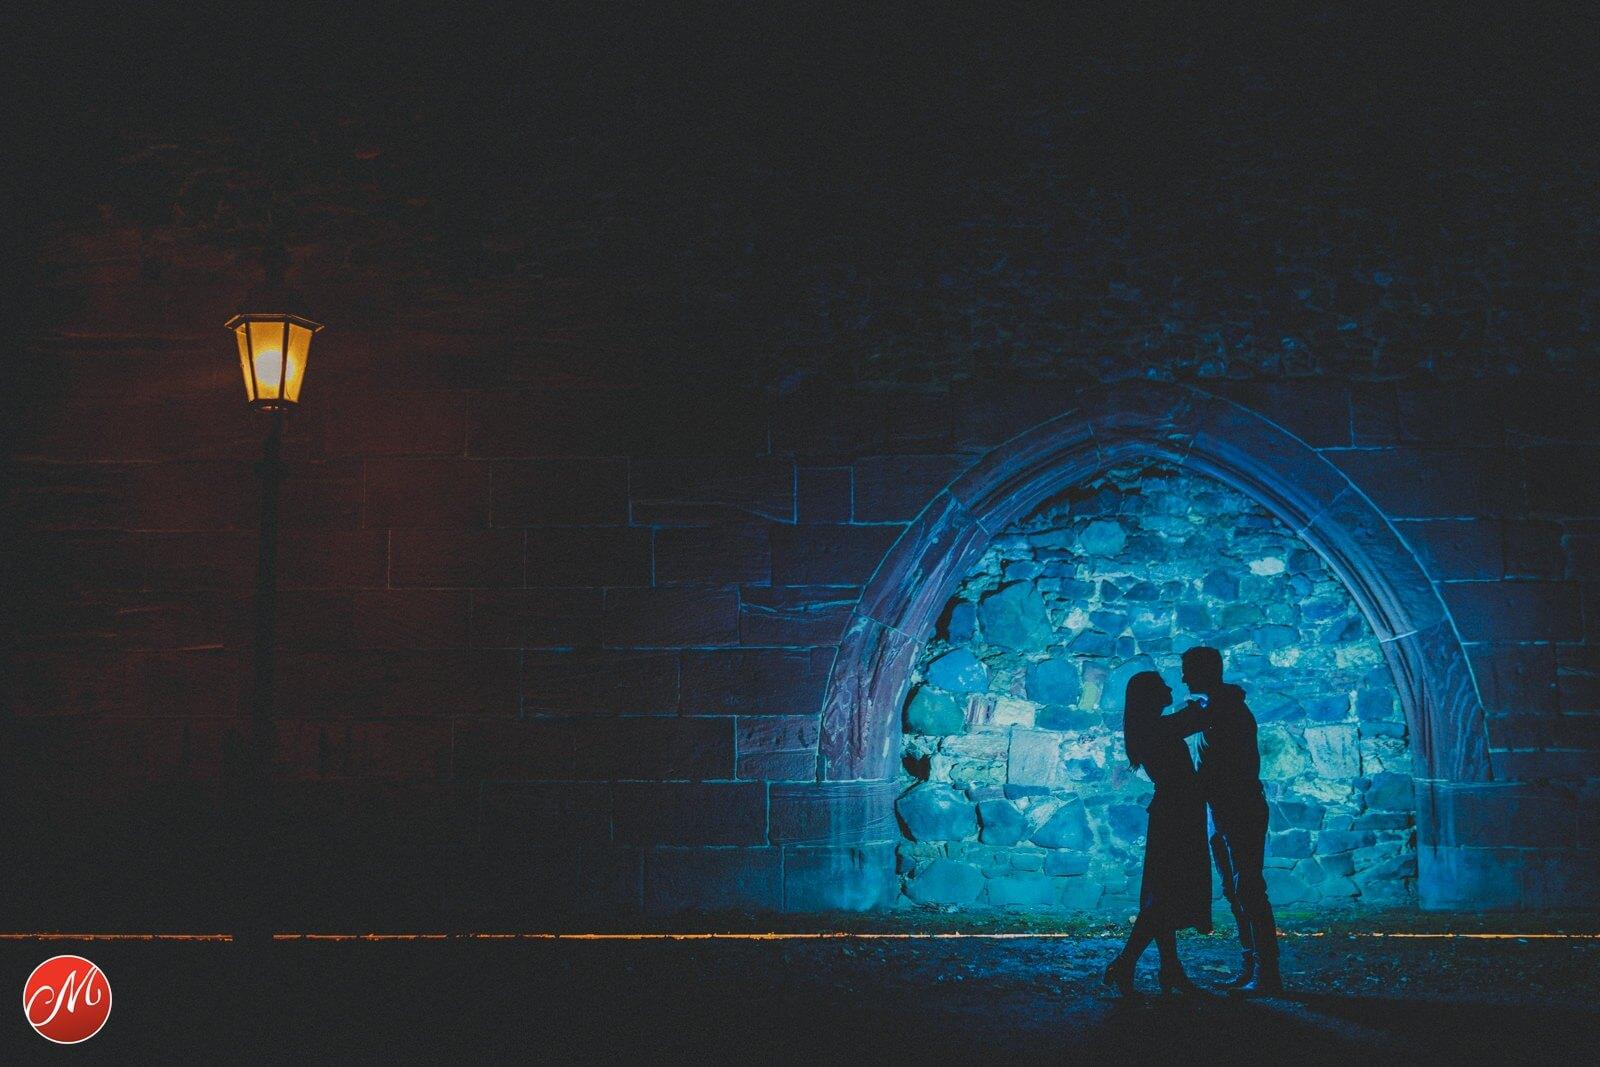 masters of german wedding photography - award nr. 48 - runde 22 - hochzeitsfoto-wettbewerb